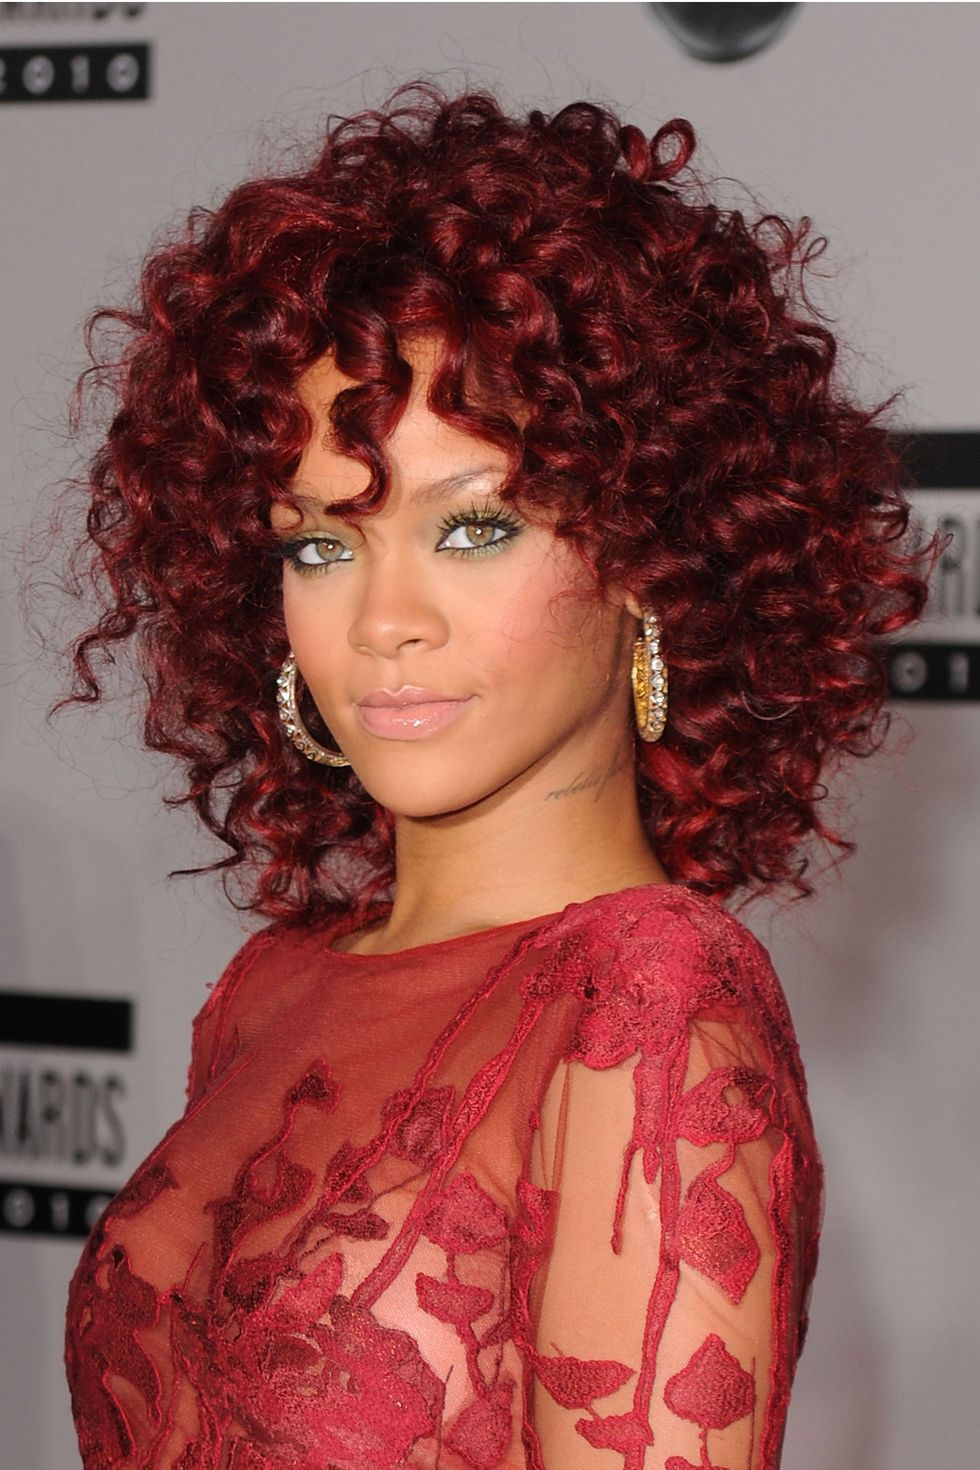 Every single Rihanna hairstyle and hair look